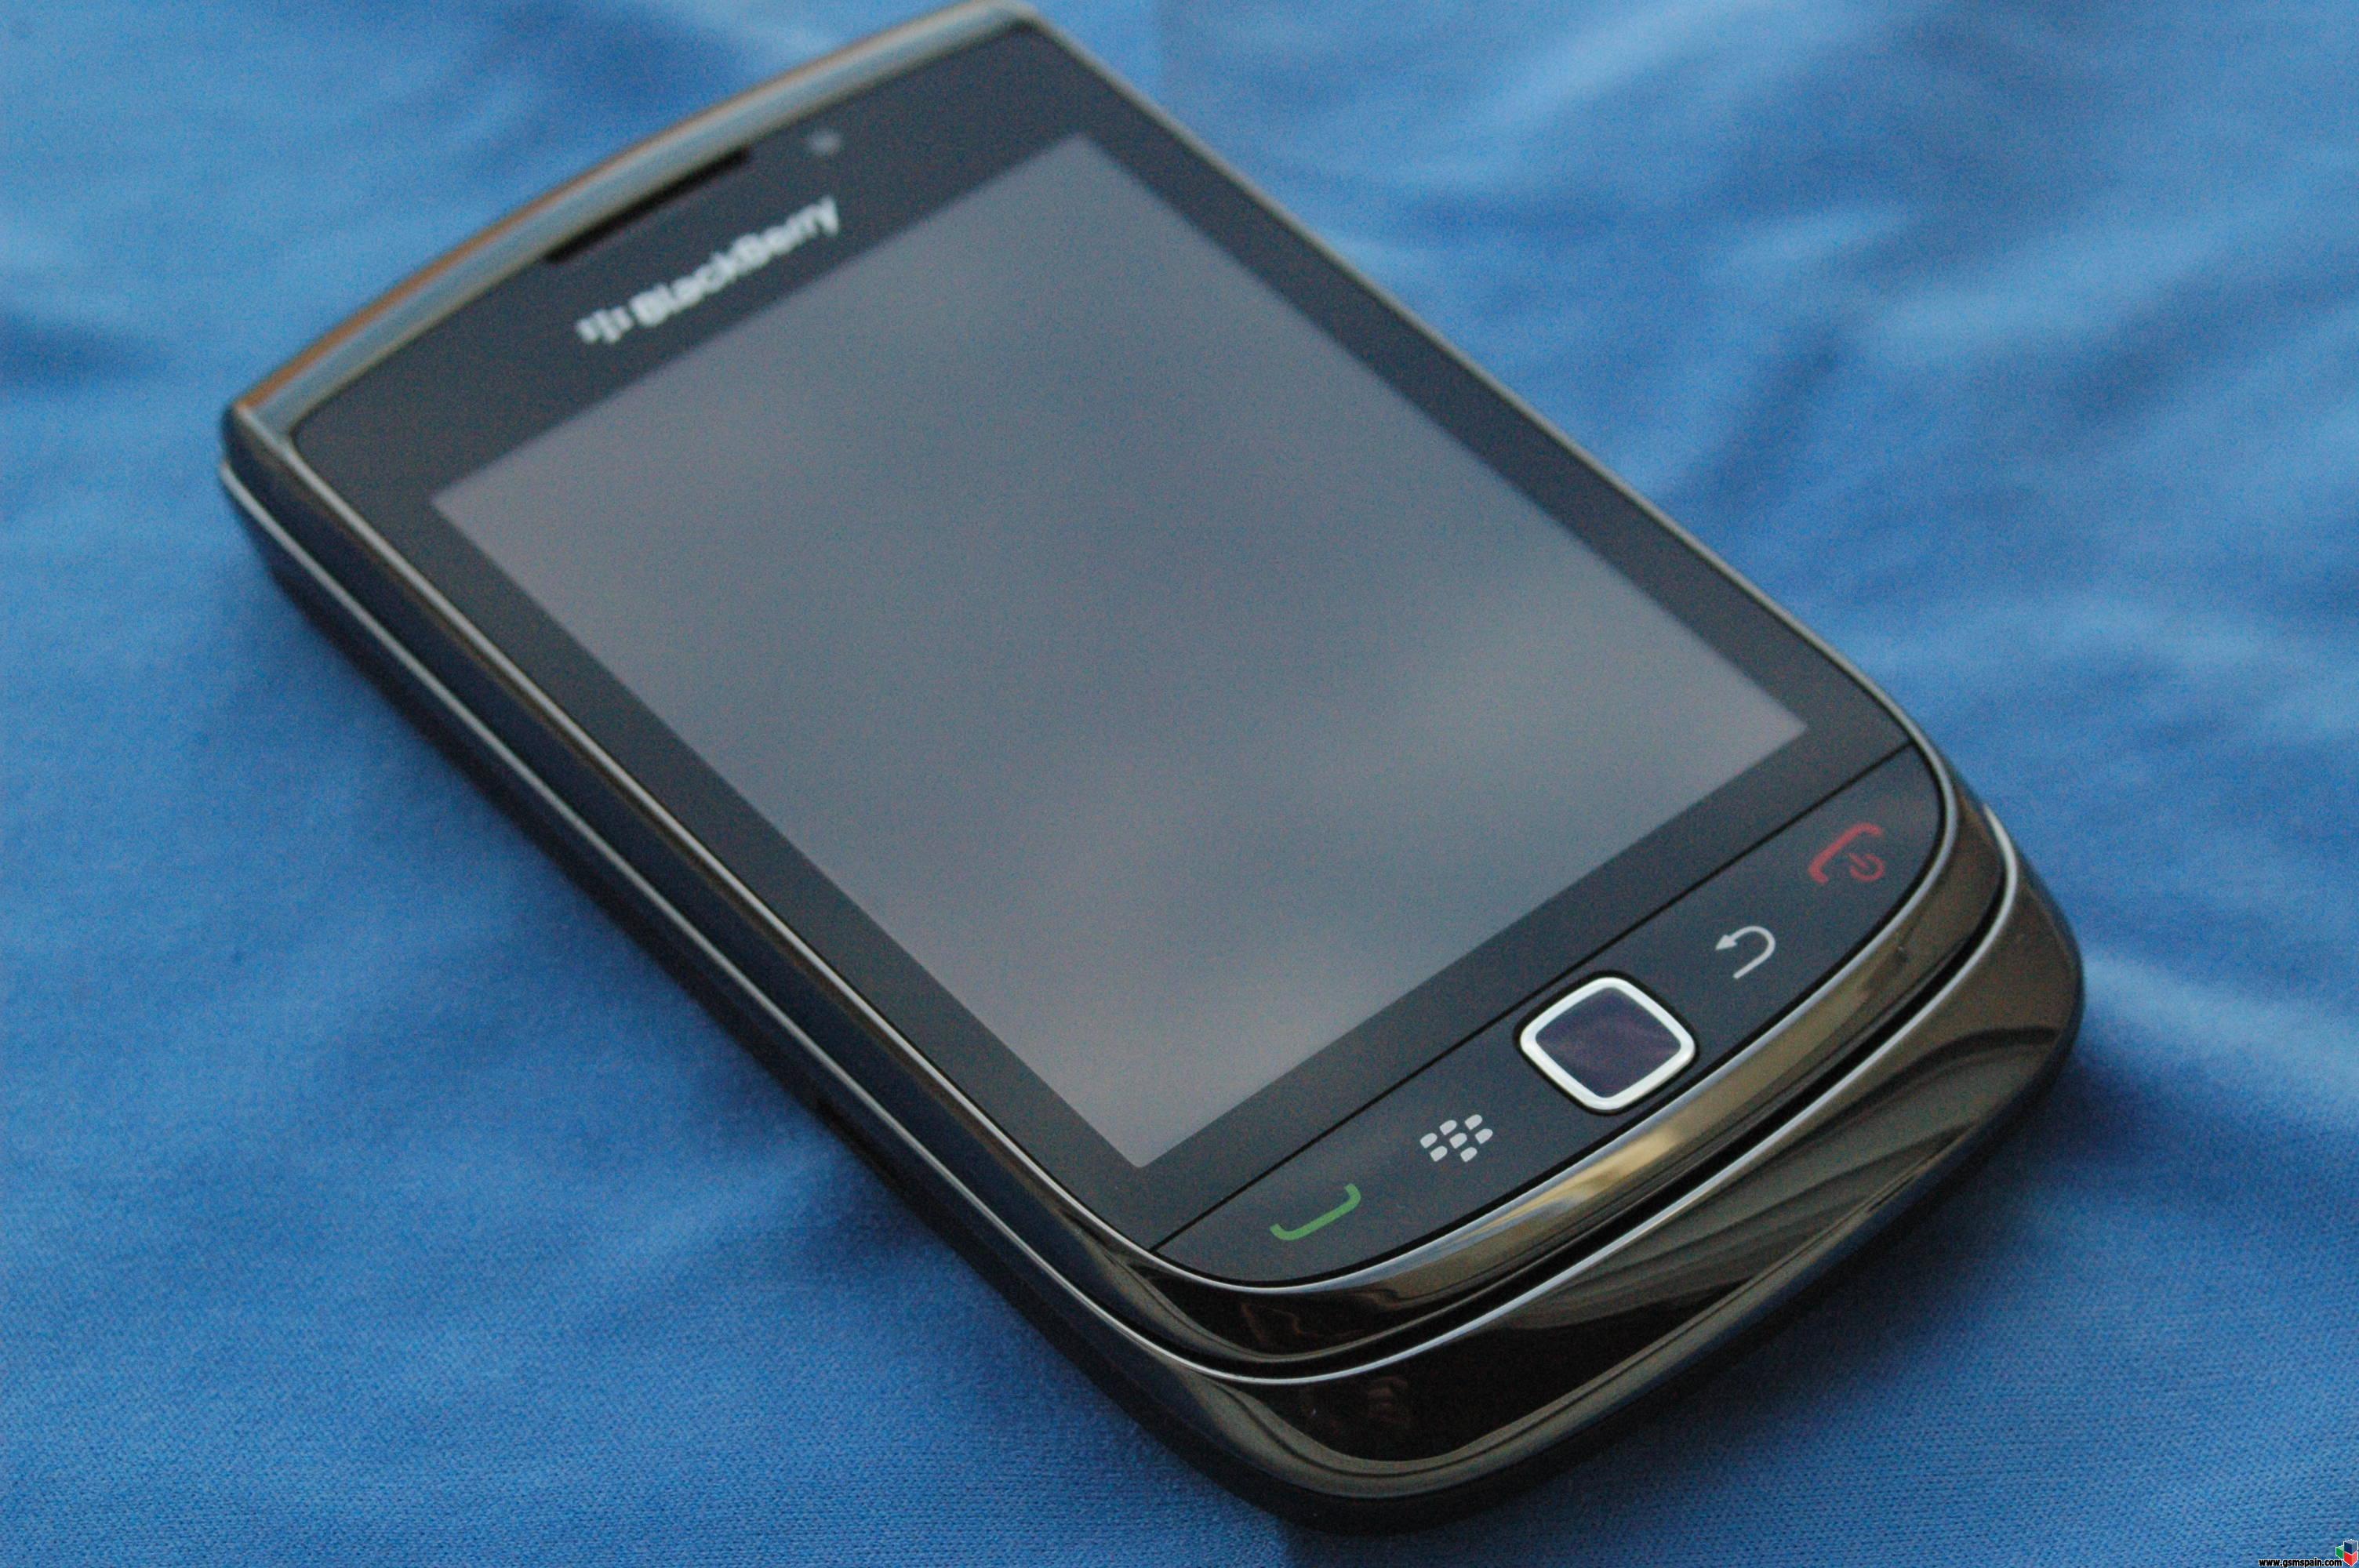 Blackberry 9800 Torch galer�a de imagenes